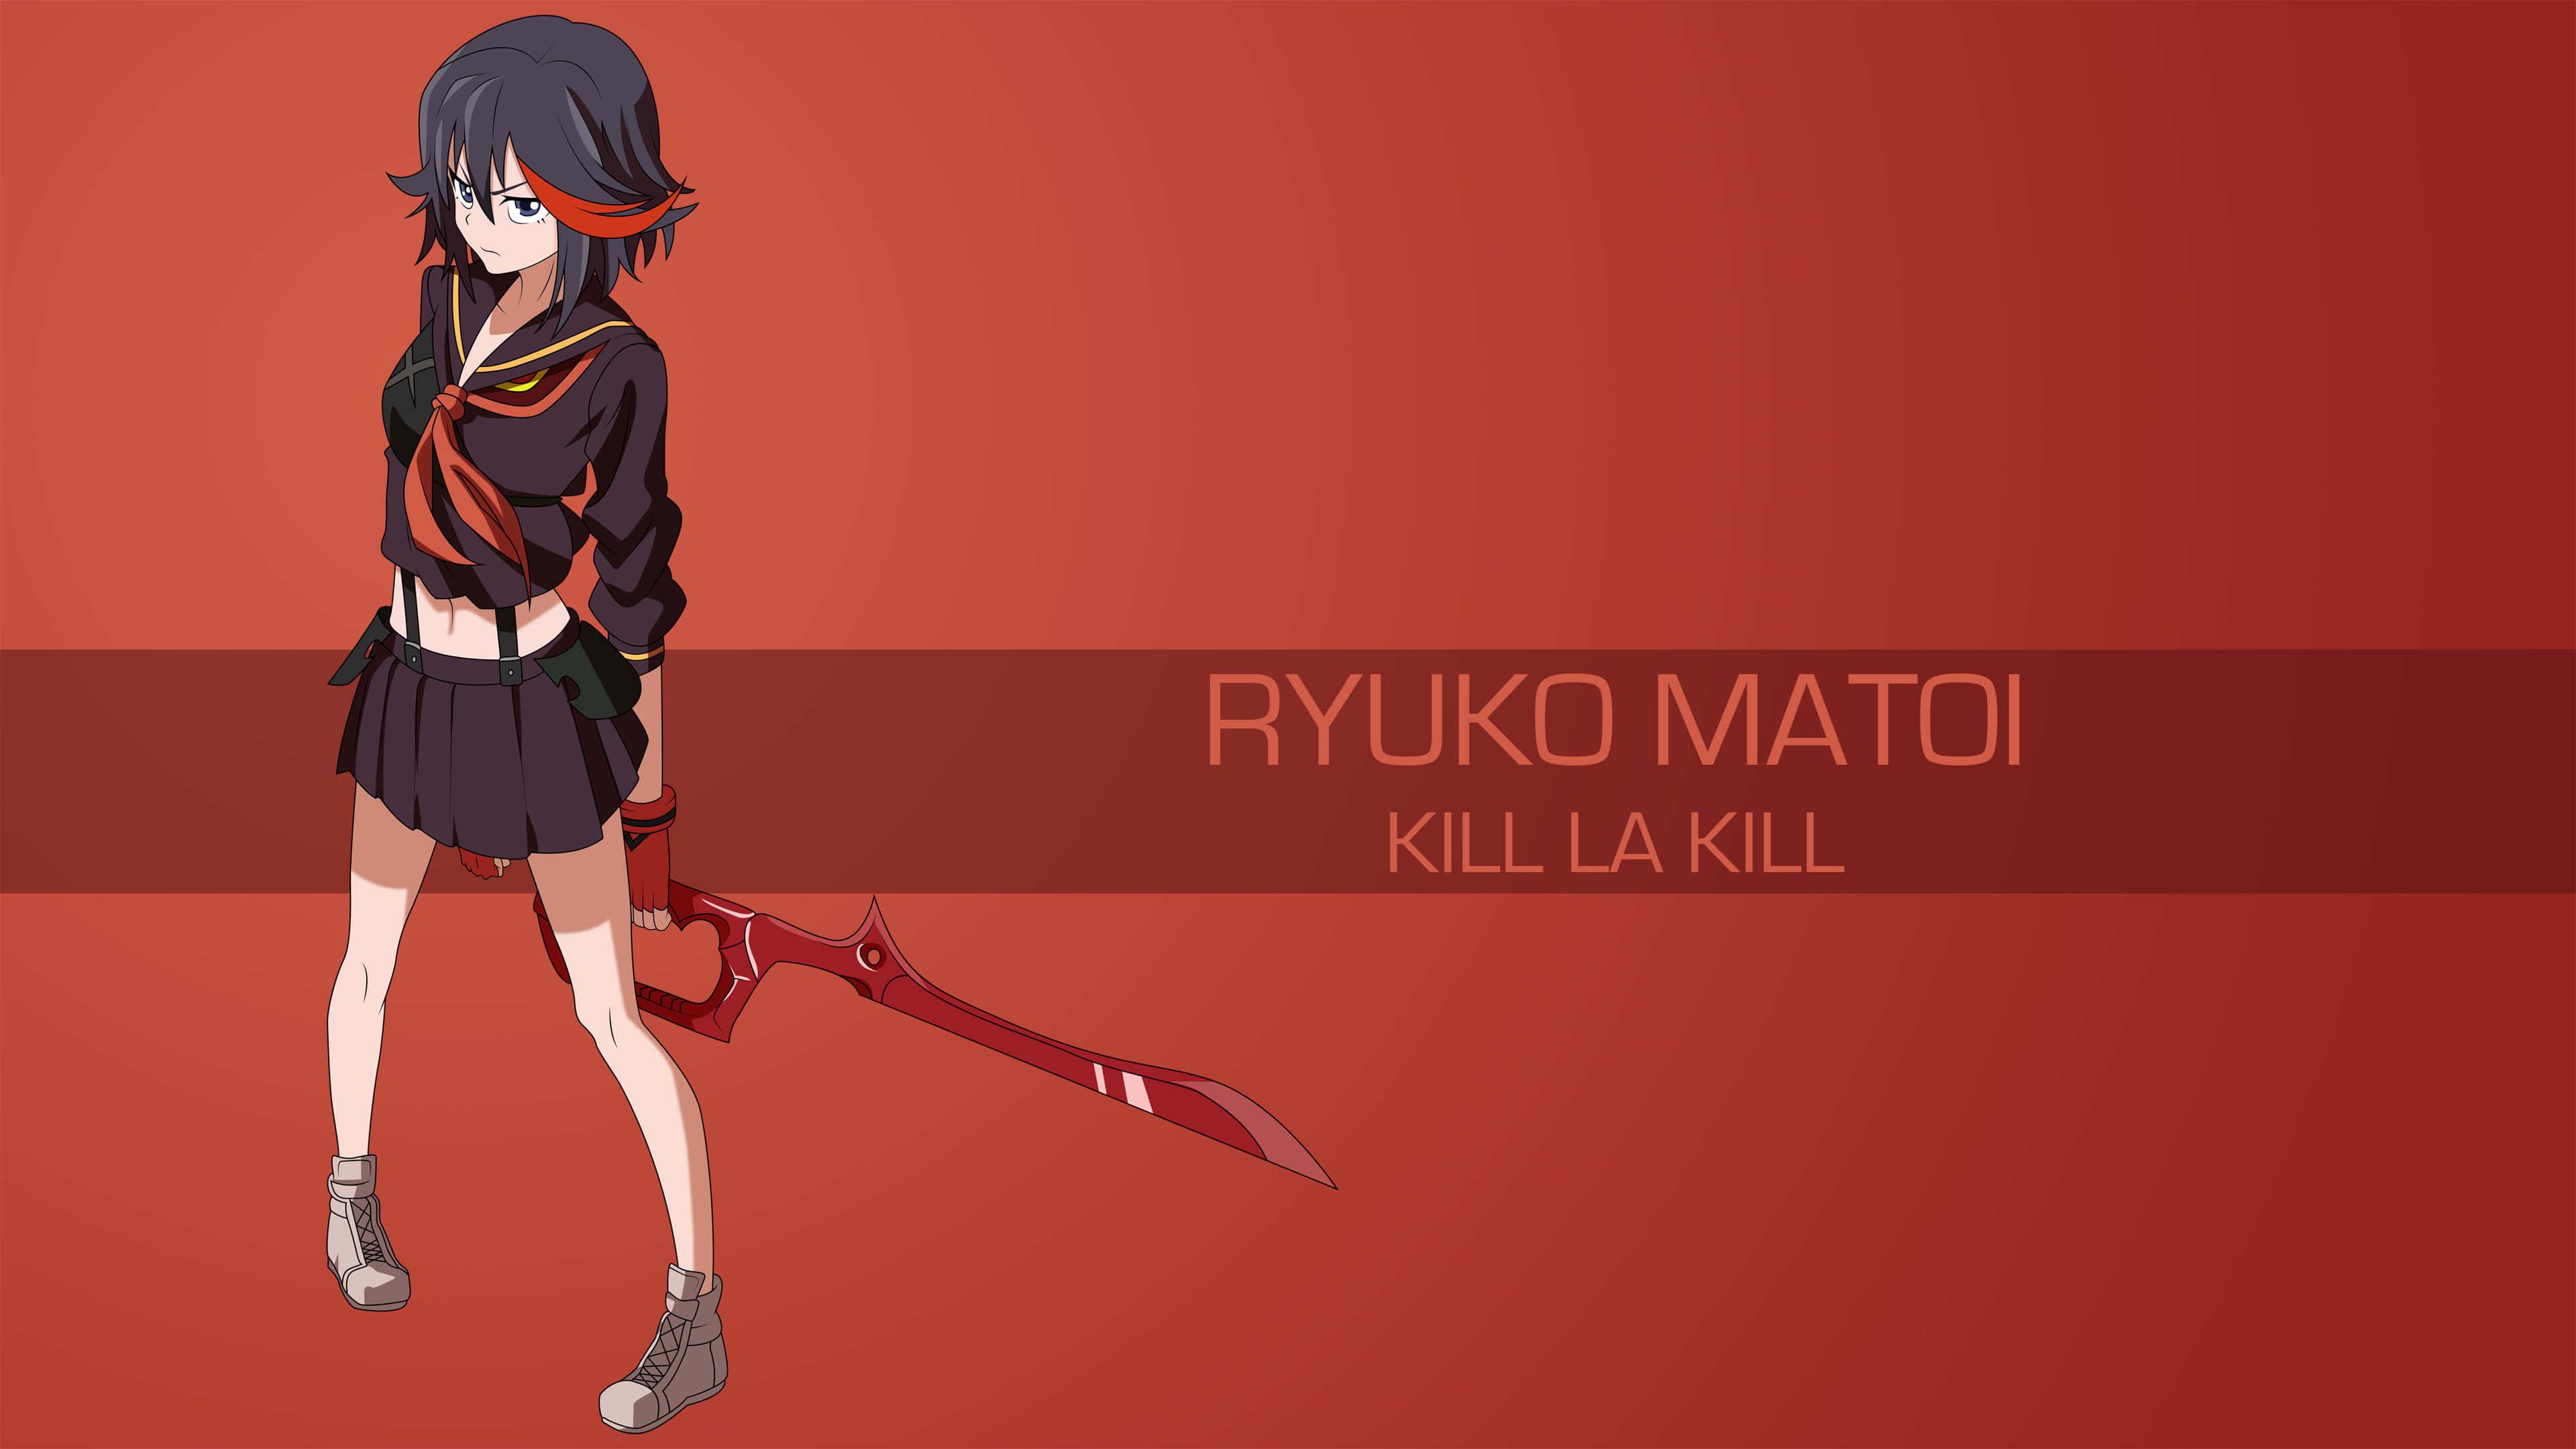 Ryuko Matoi Kill La Kill Uhd 4k Wallpaper Pixelz